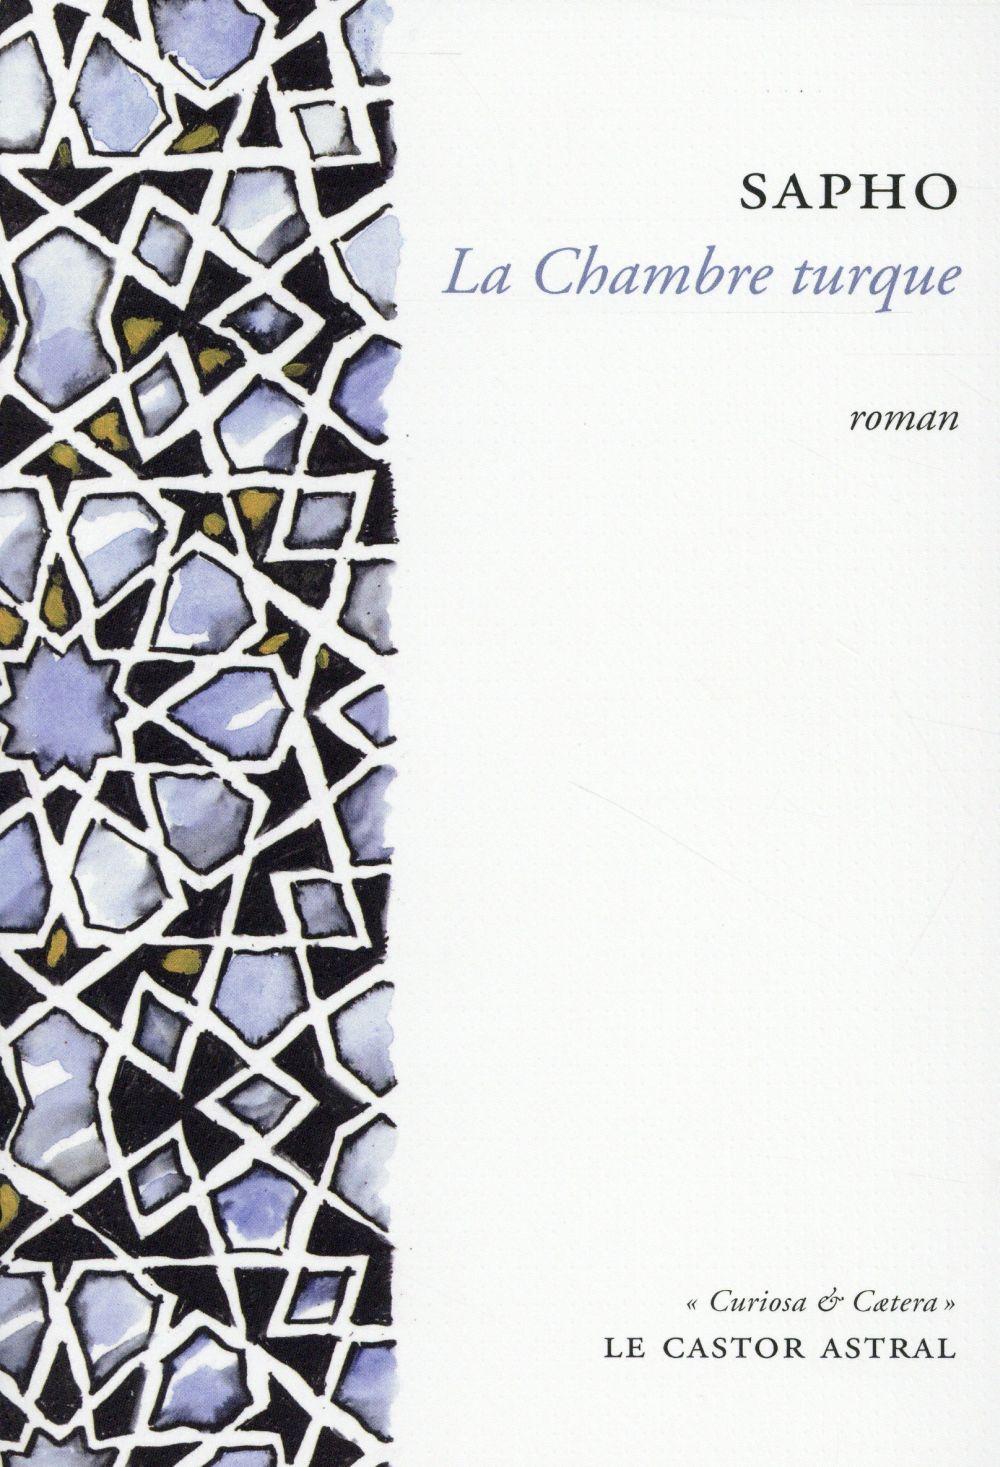 LA CHAMBRE TURQUE